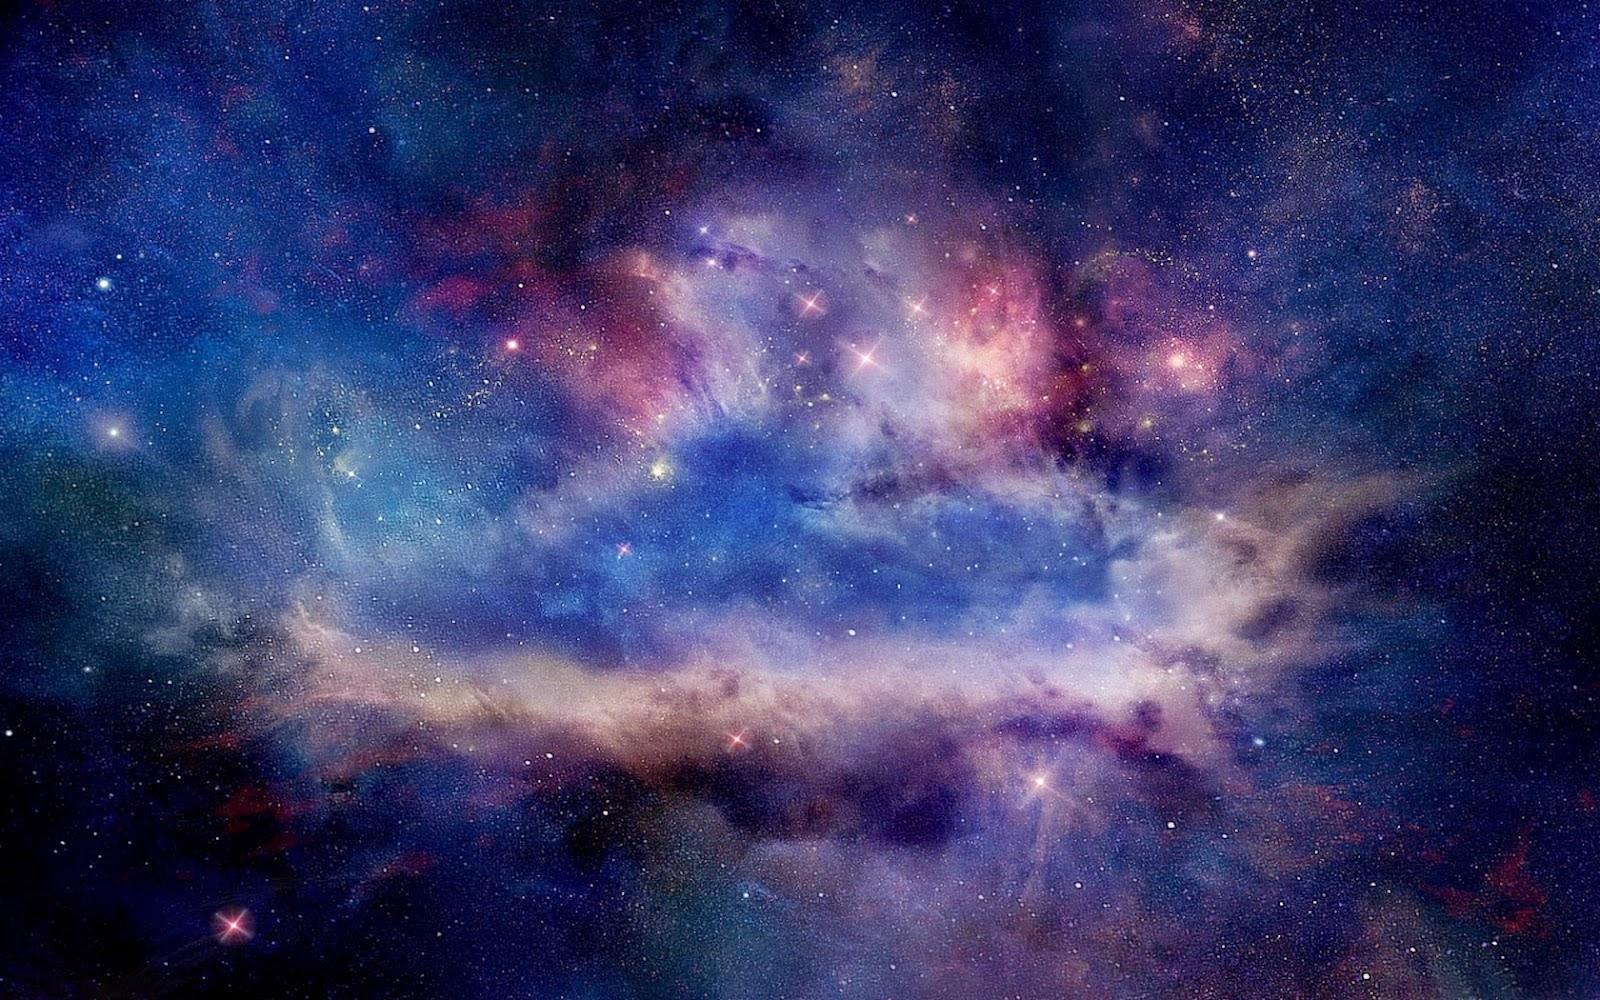 Wallpapers del espacio hd full hd wallpapers de for Espacio exterior 4k